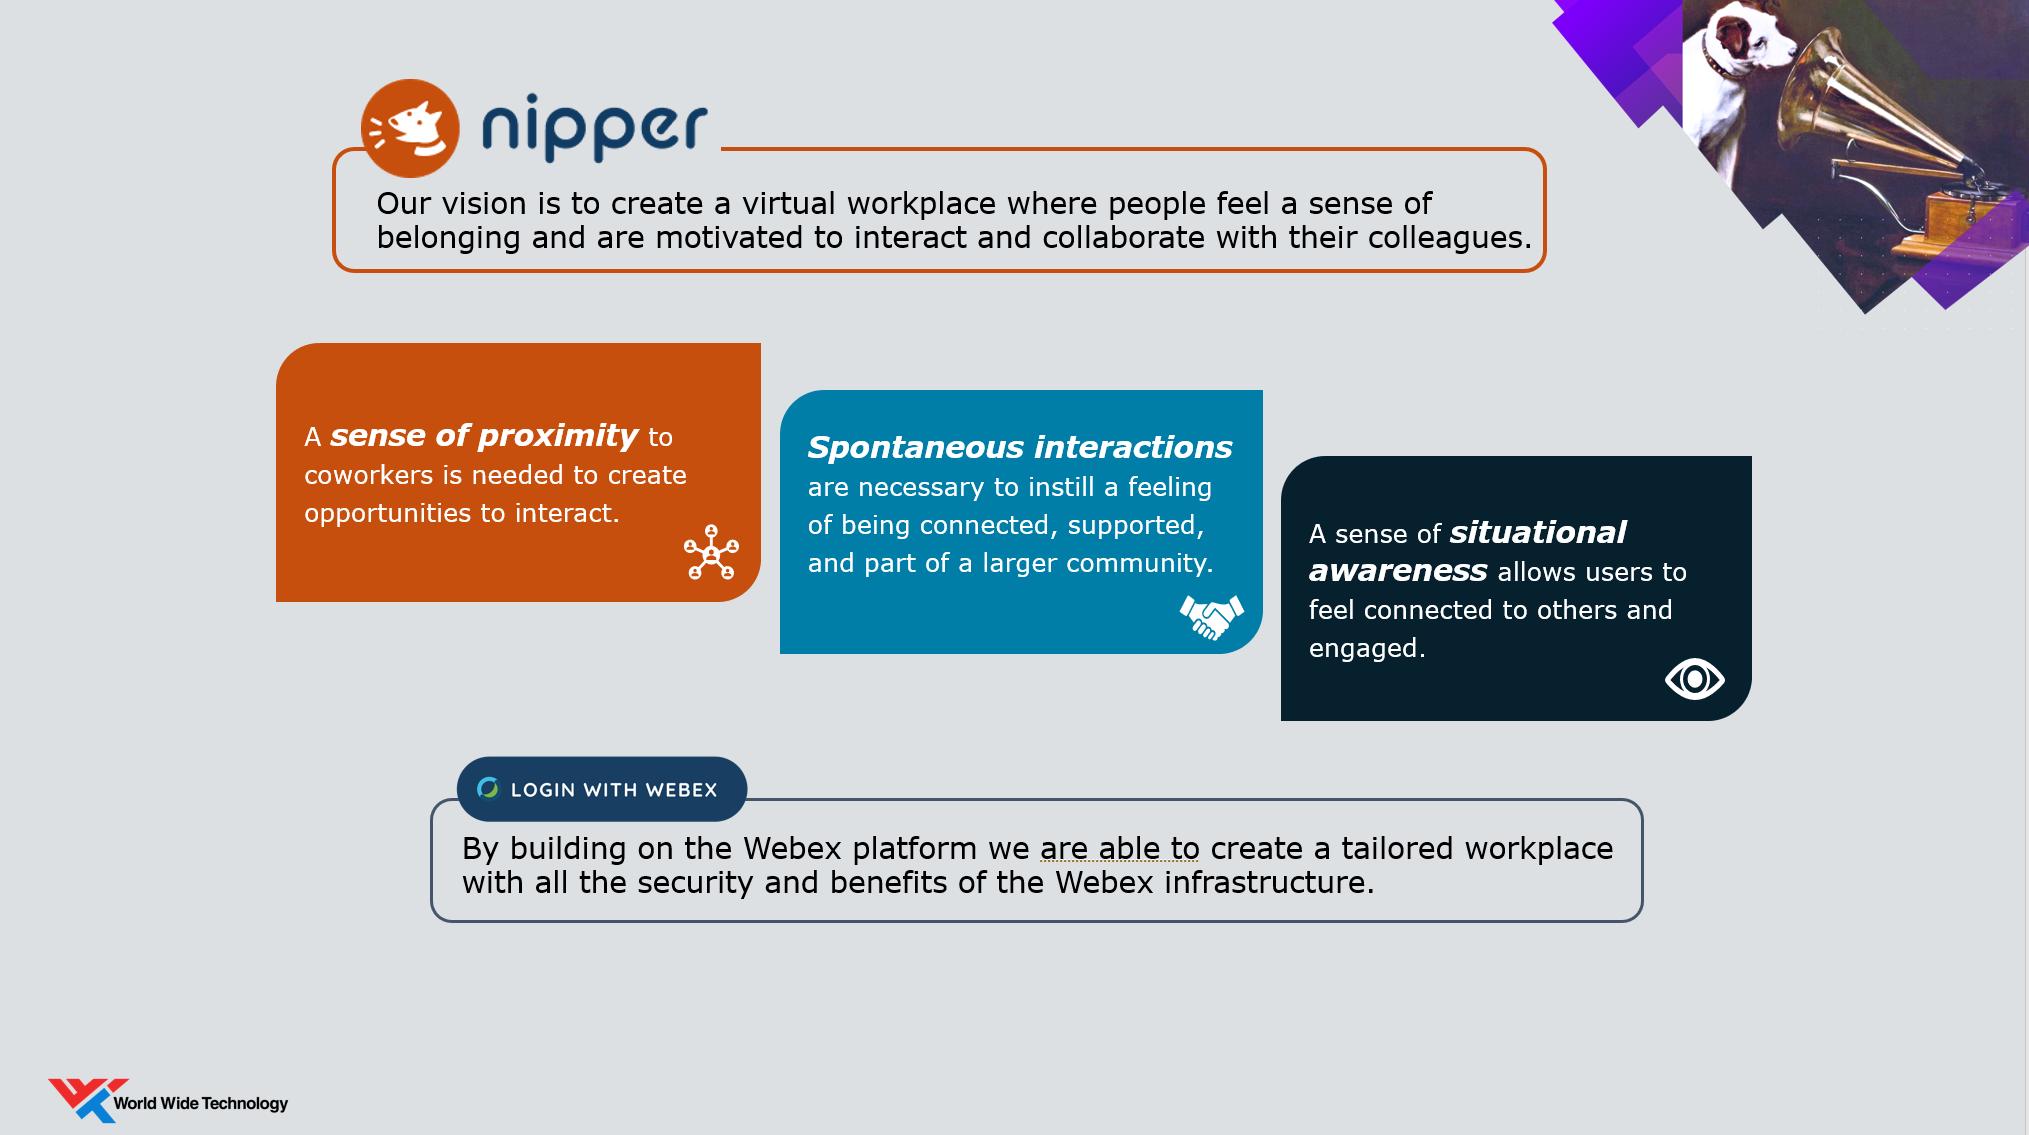 Nipper and WWT